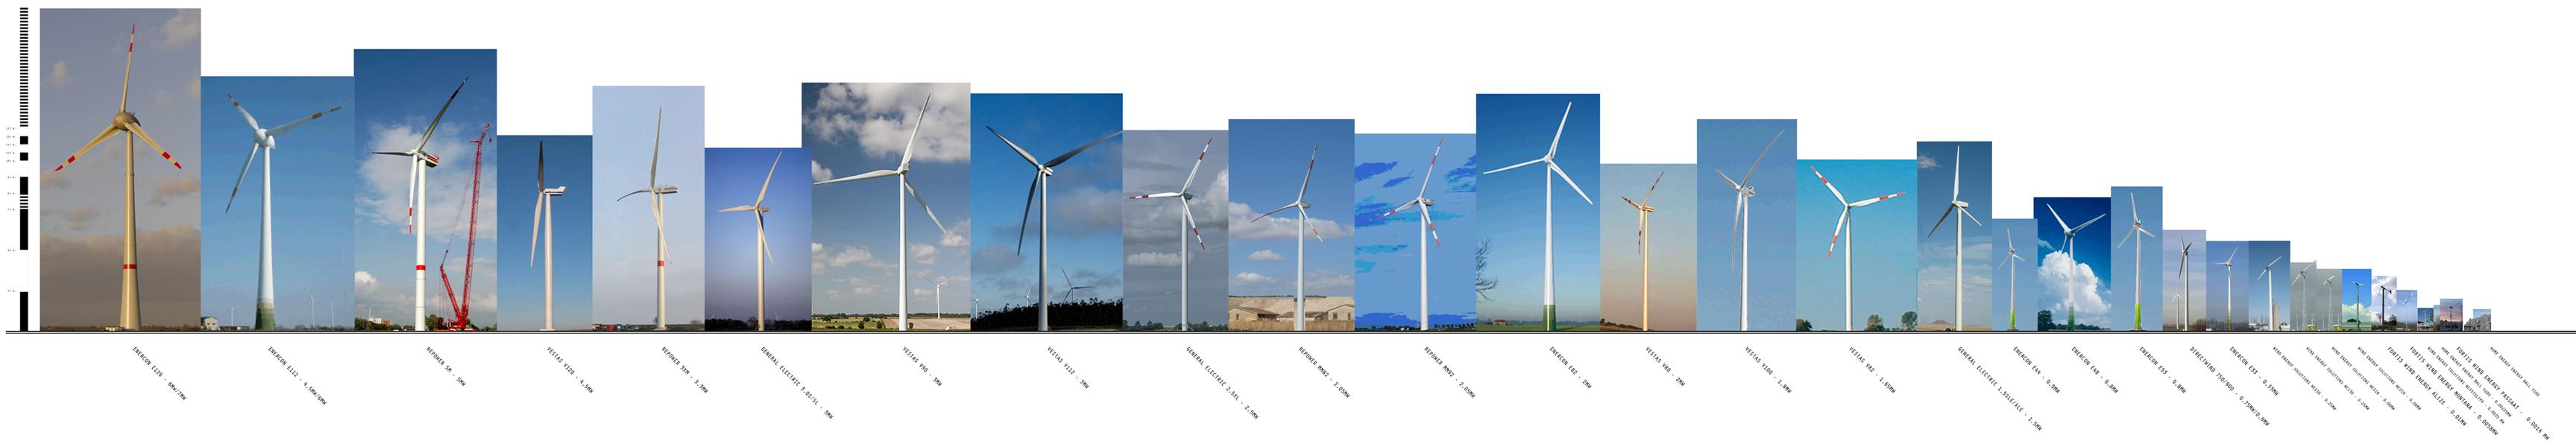 windmolens-hoogte-opbrengst-vanbeekrietveldbeaufort